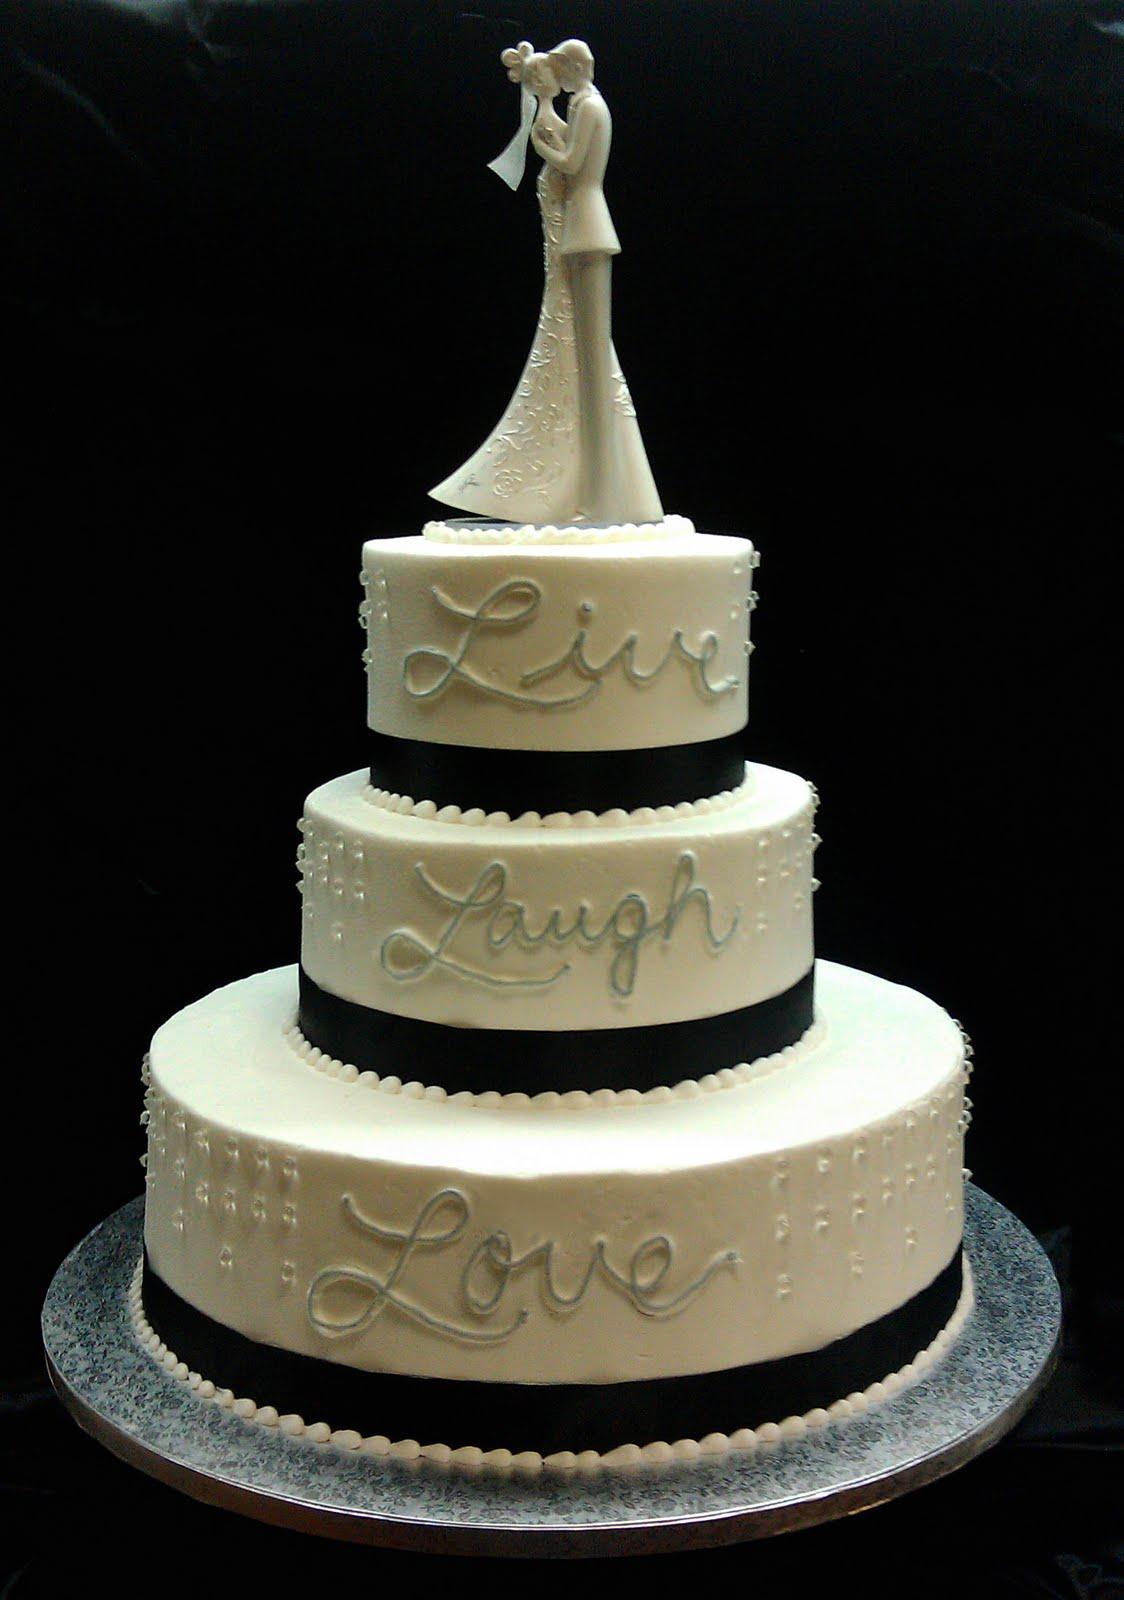 Wedding - Live, laugh, Love - Round - Level2